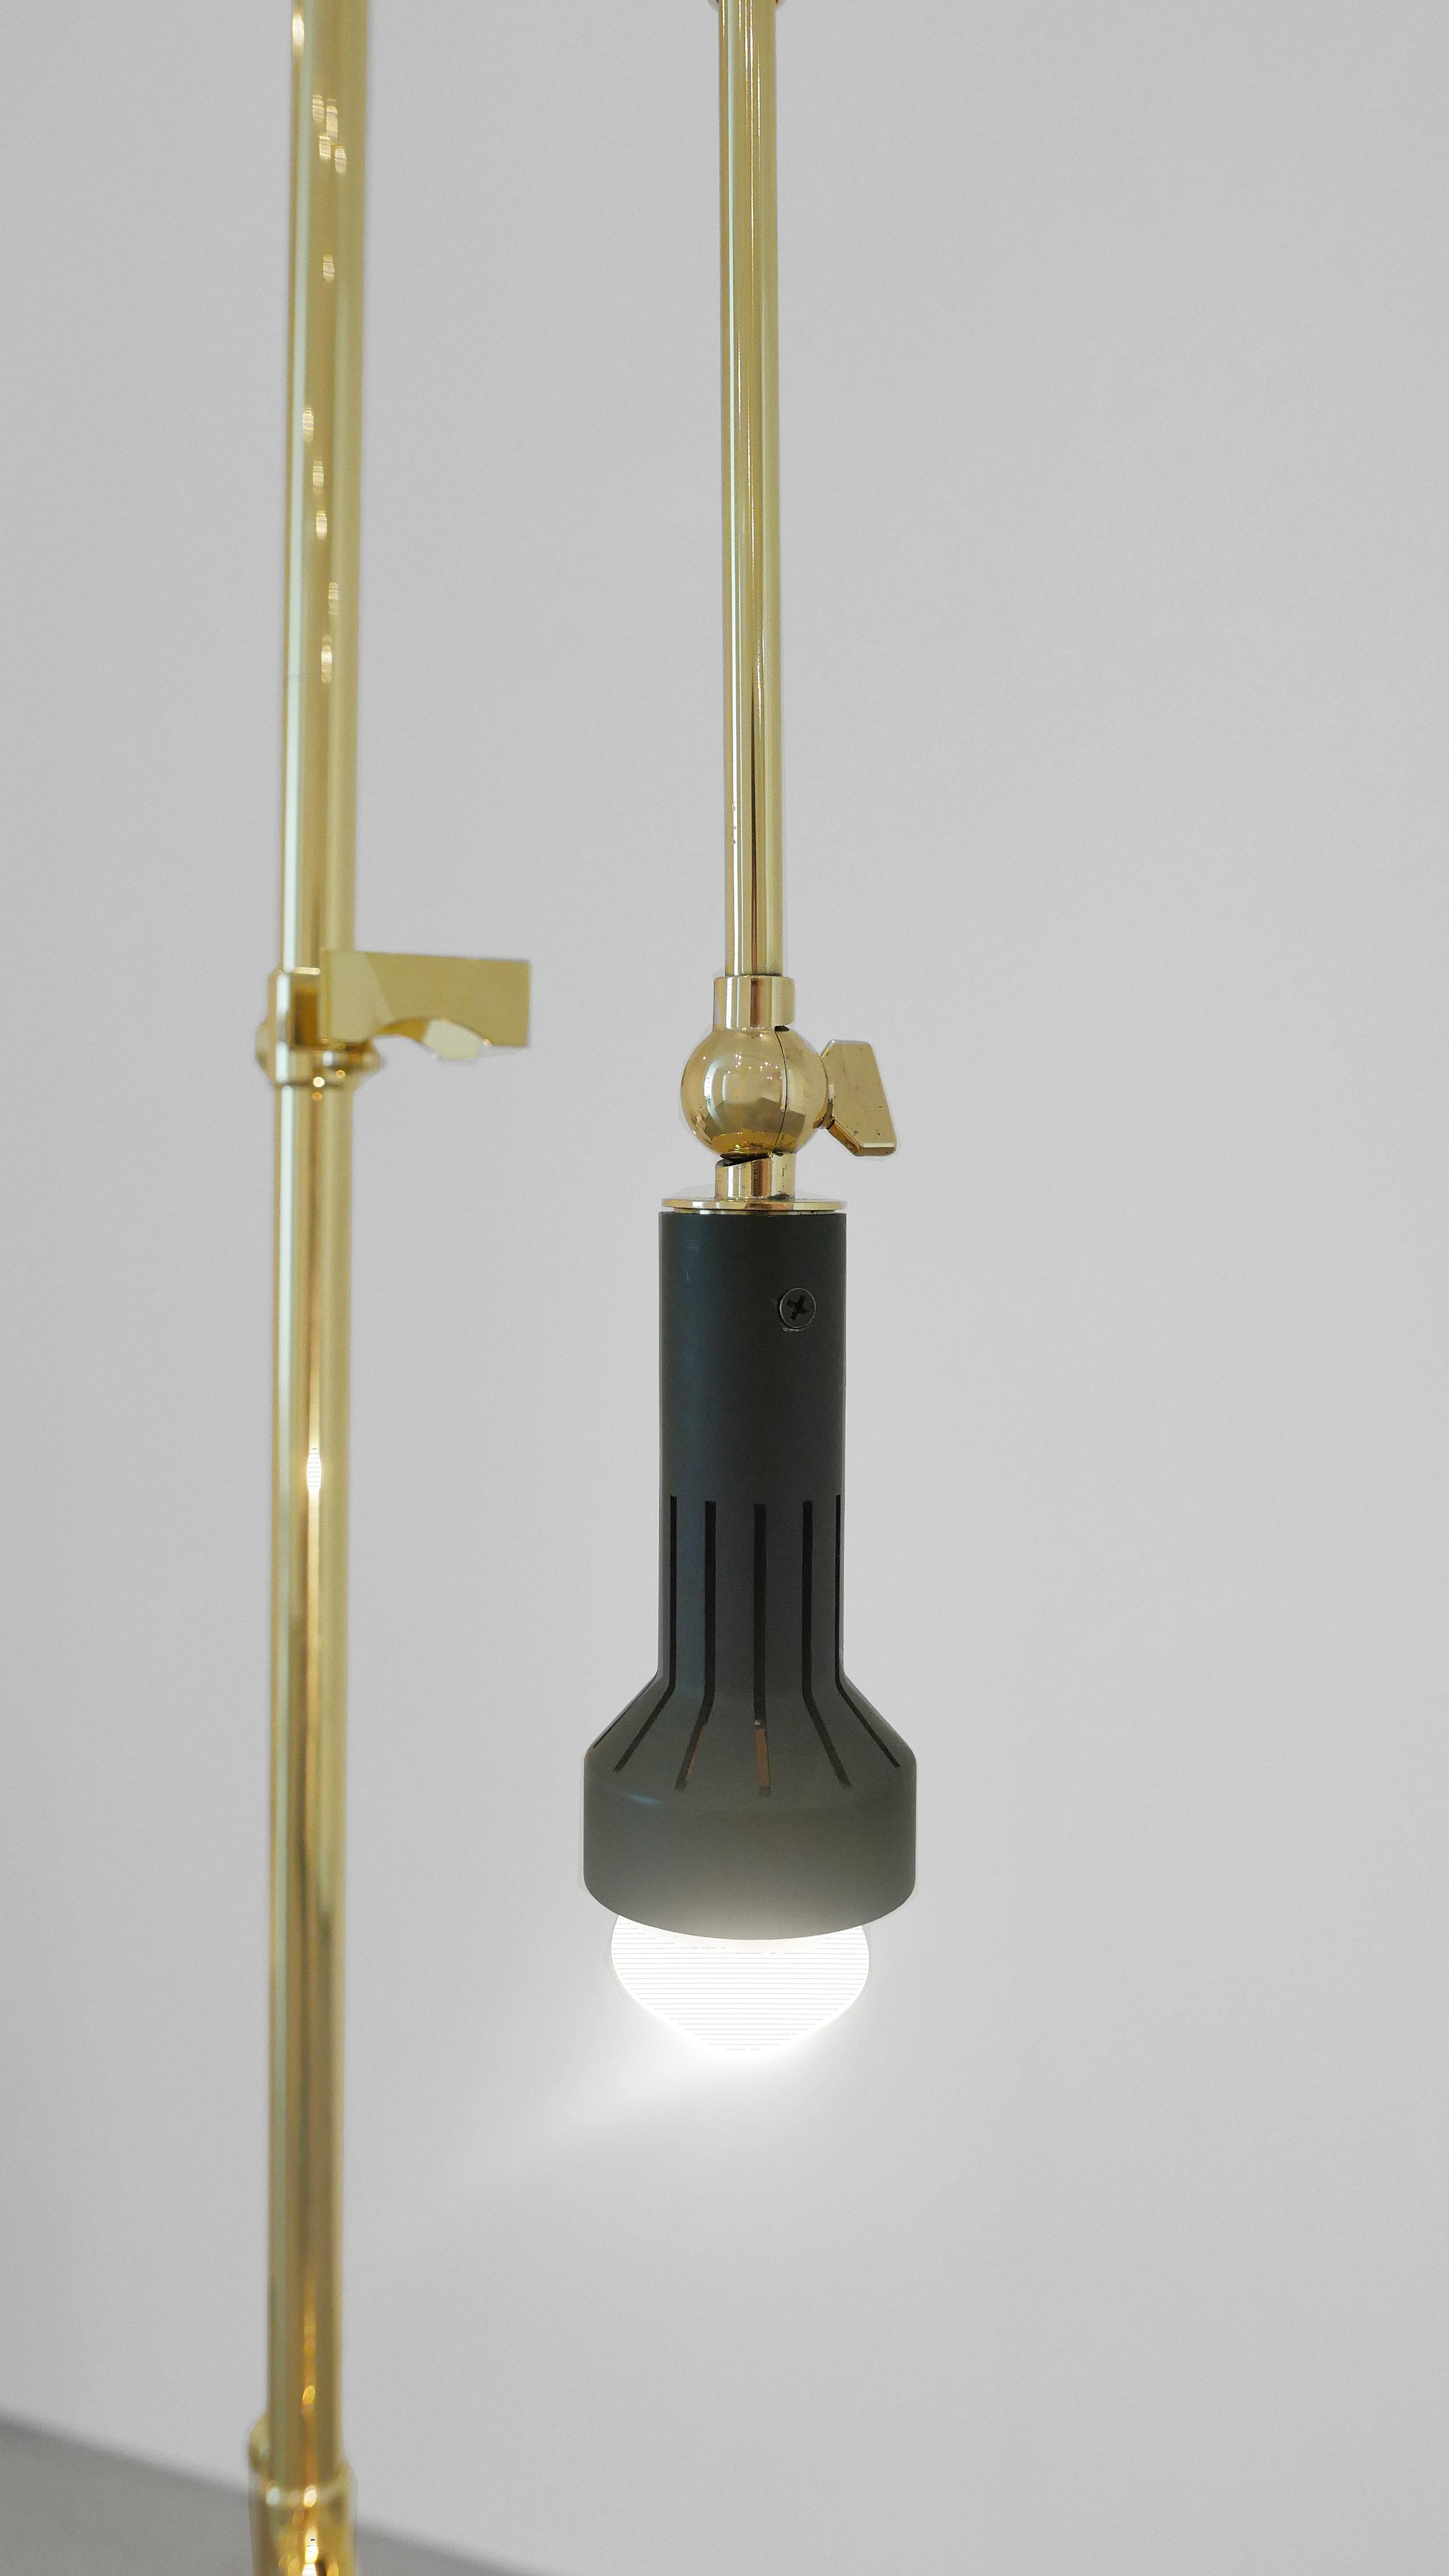 Angelo Lelli Easel Lamp for Arredoluce, c. 1950-1959, Brass, 82 H x 22.5 W x 33 D inches_3.jpg